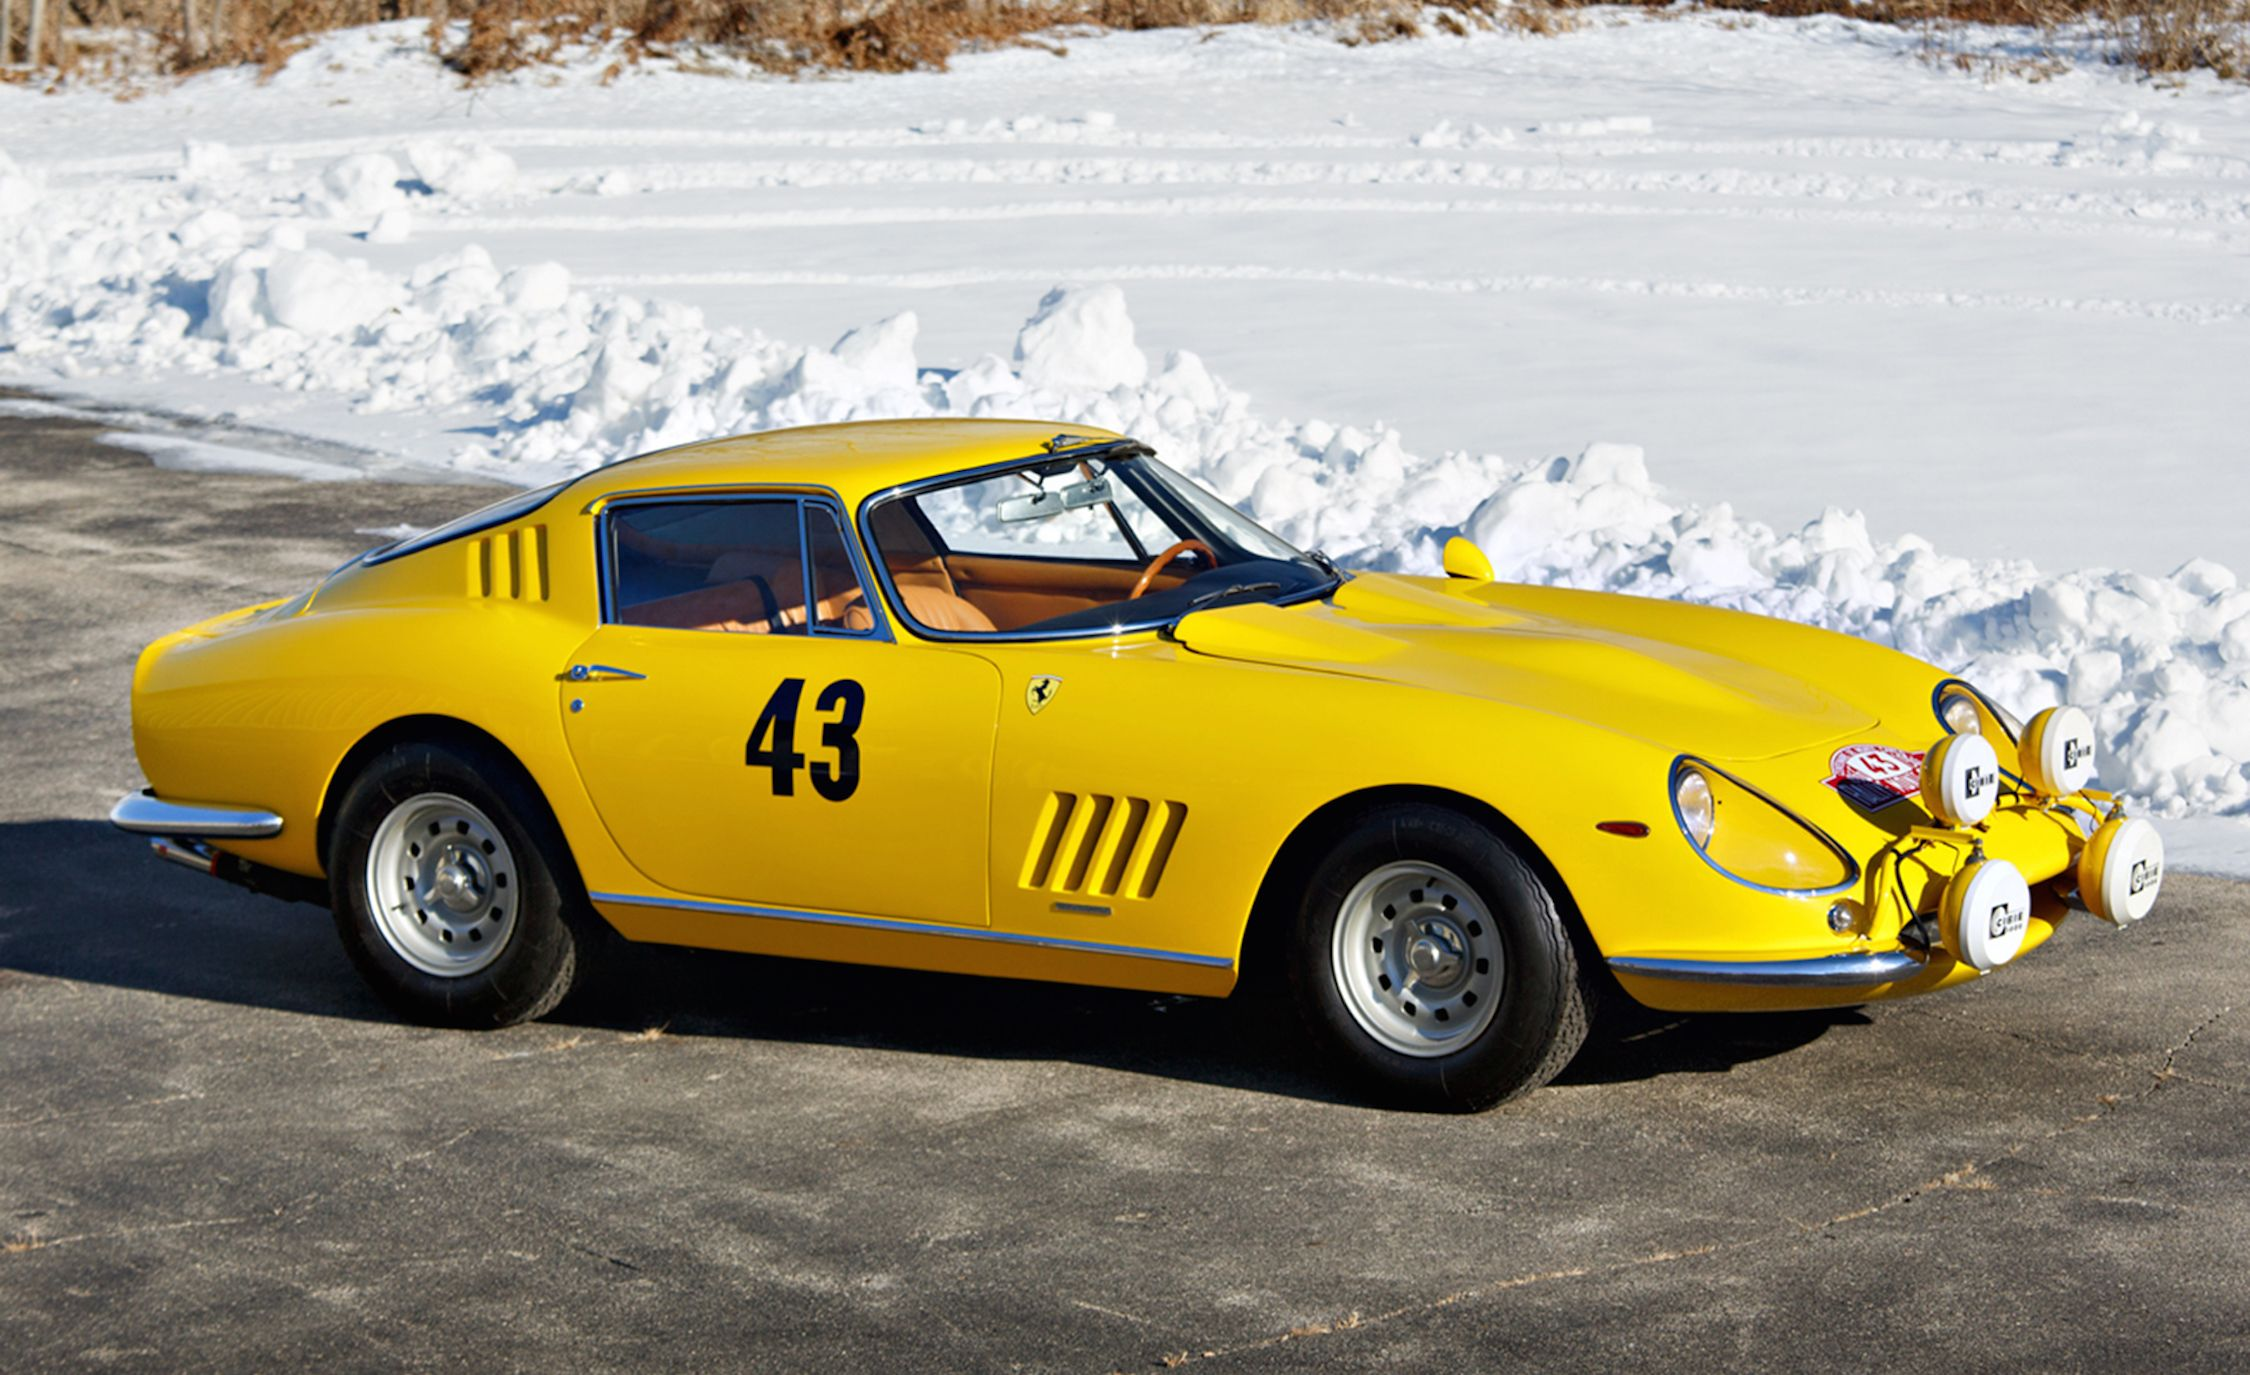 1964 ferrari 275 gtb prototype going up for sale